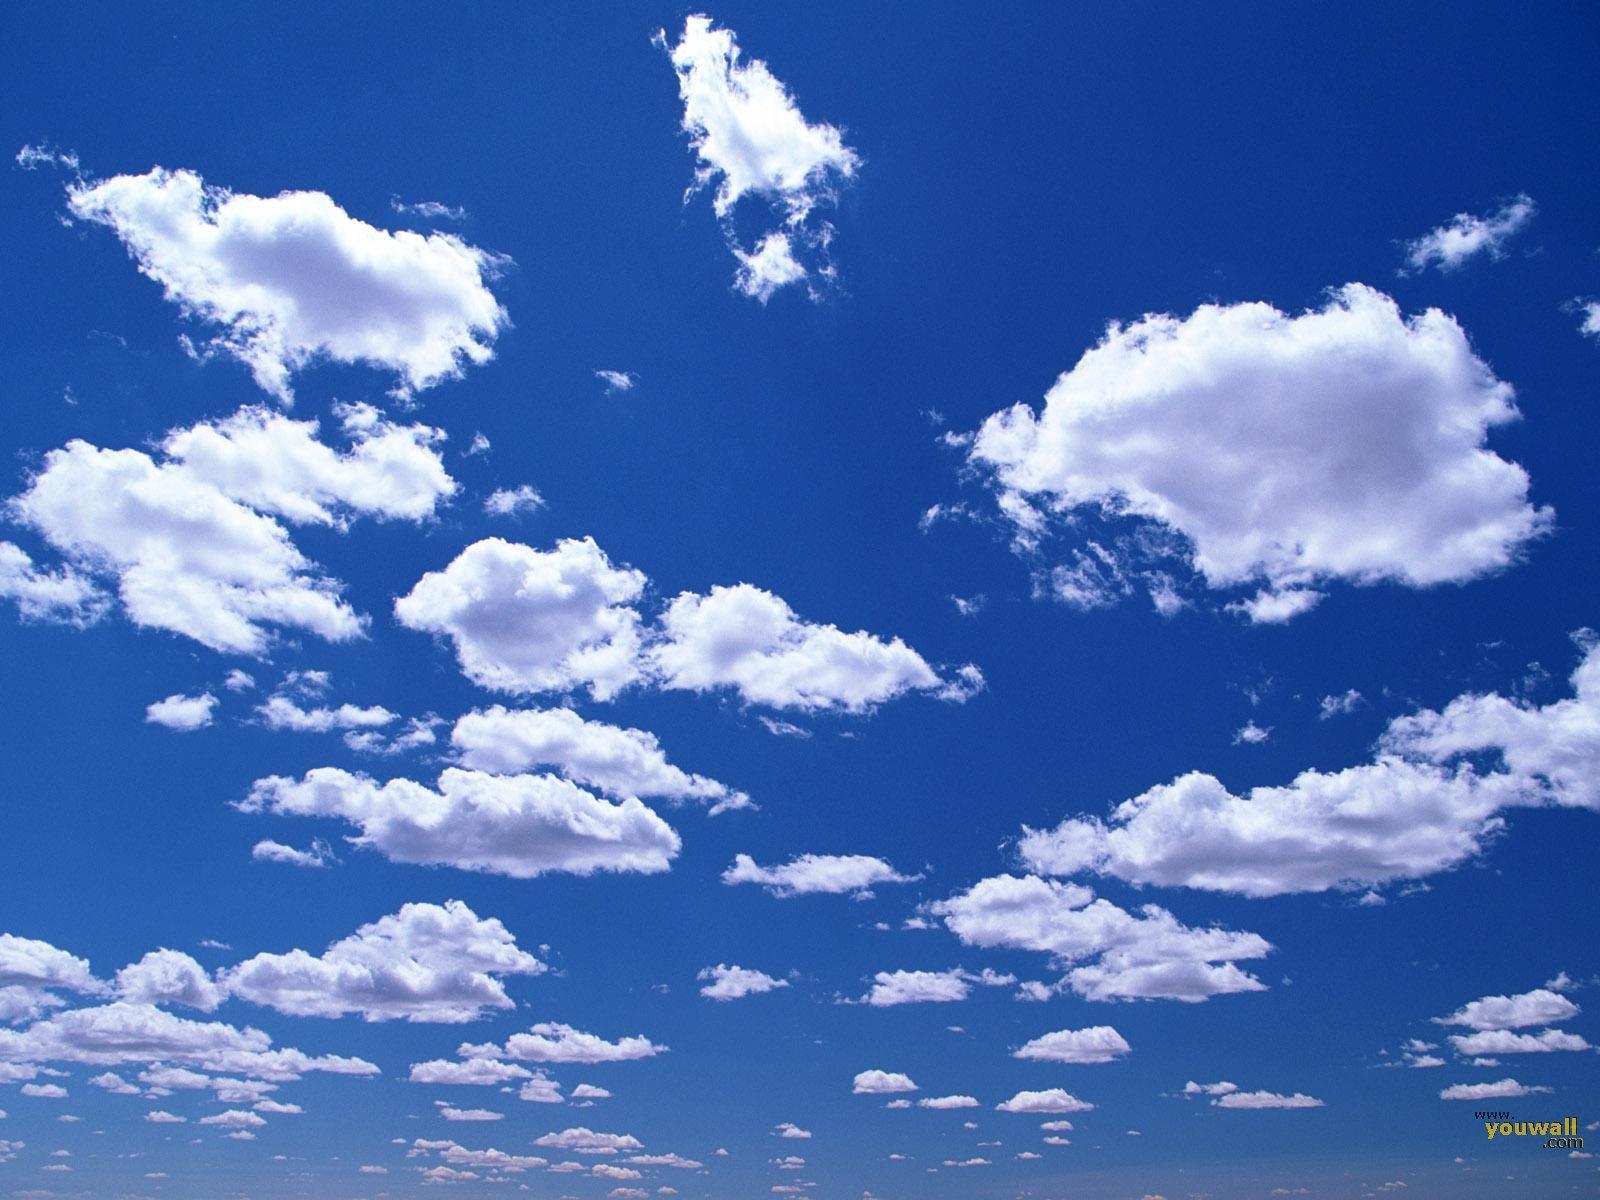 YouWall   Cloud Sky Wallpaper   wallpaperwallpapersfree 1600x1200